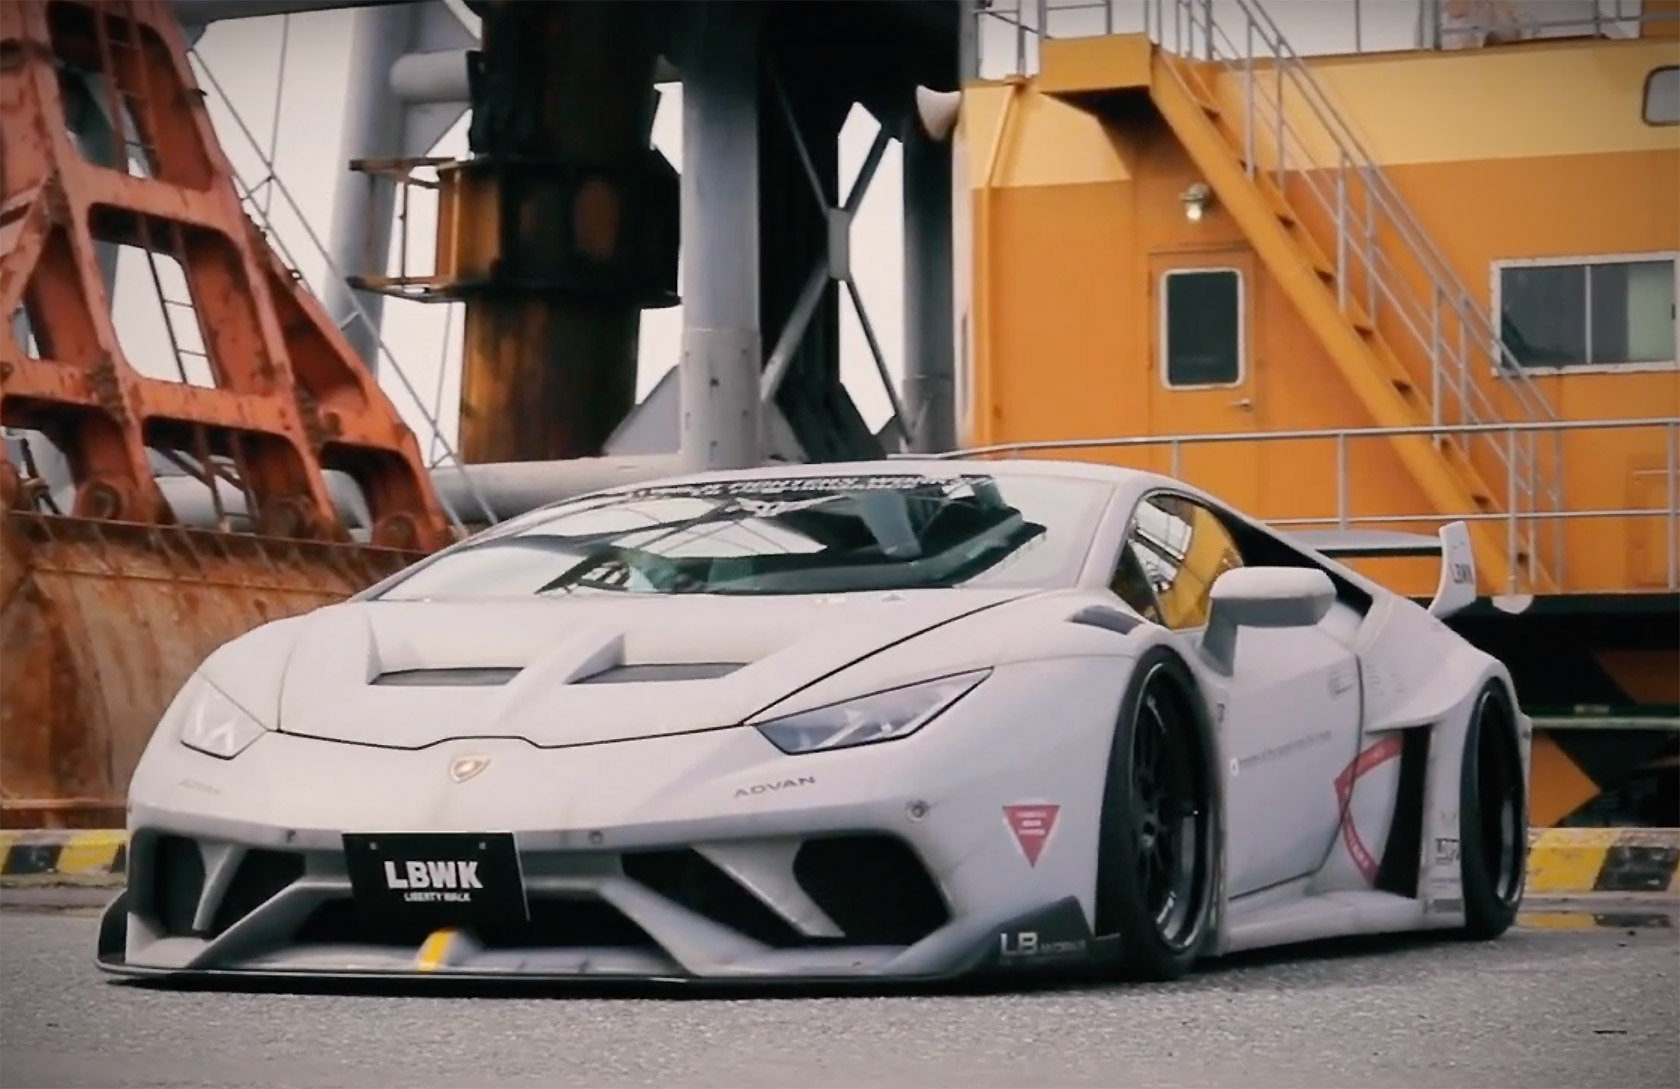 Liberty Walk LB-Silhouette Works GT Lamborghini Huracan